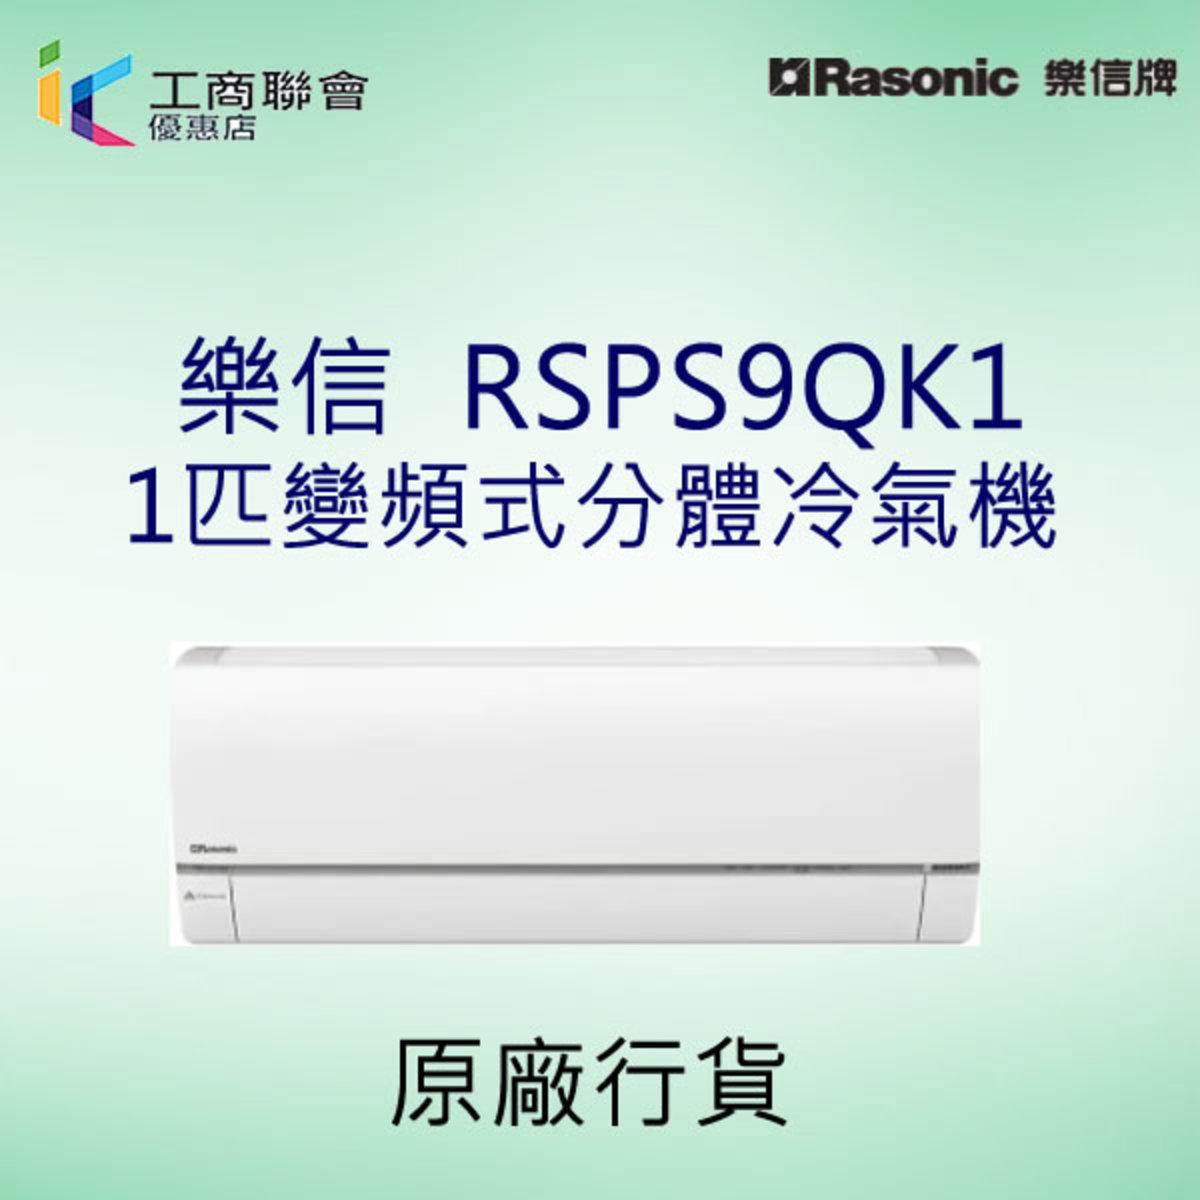 RSPS9QK1 1 Inverter Split Air-conditioner